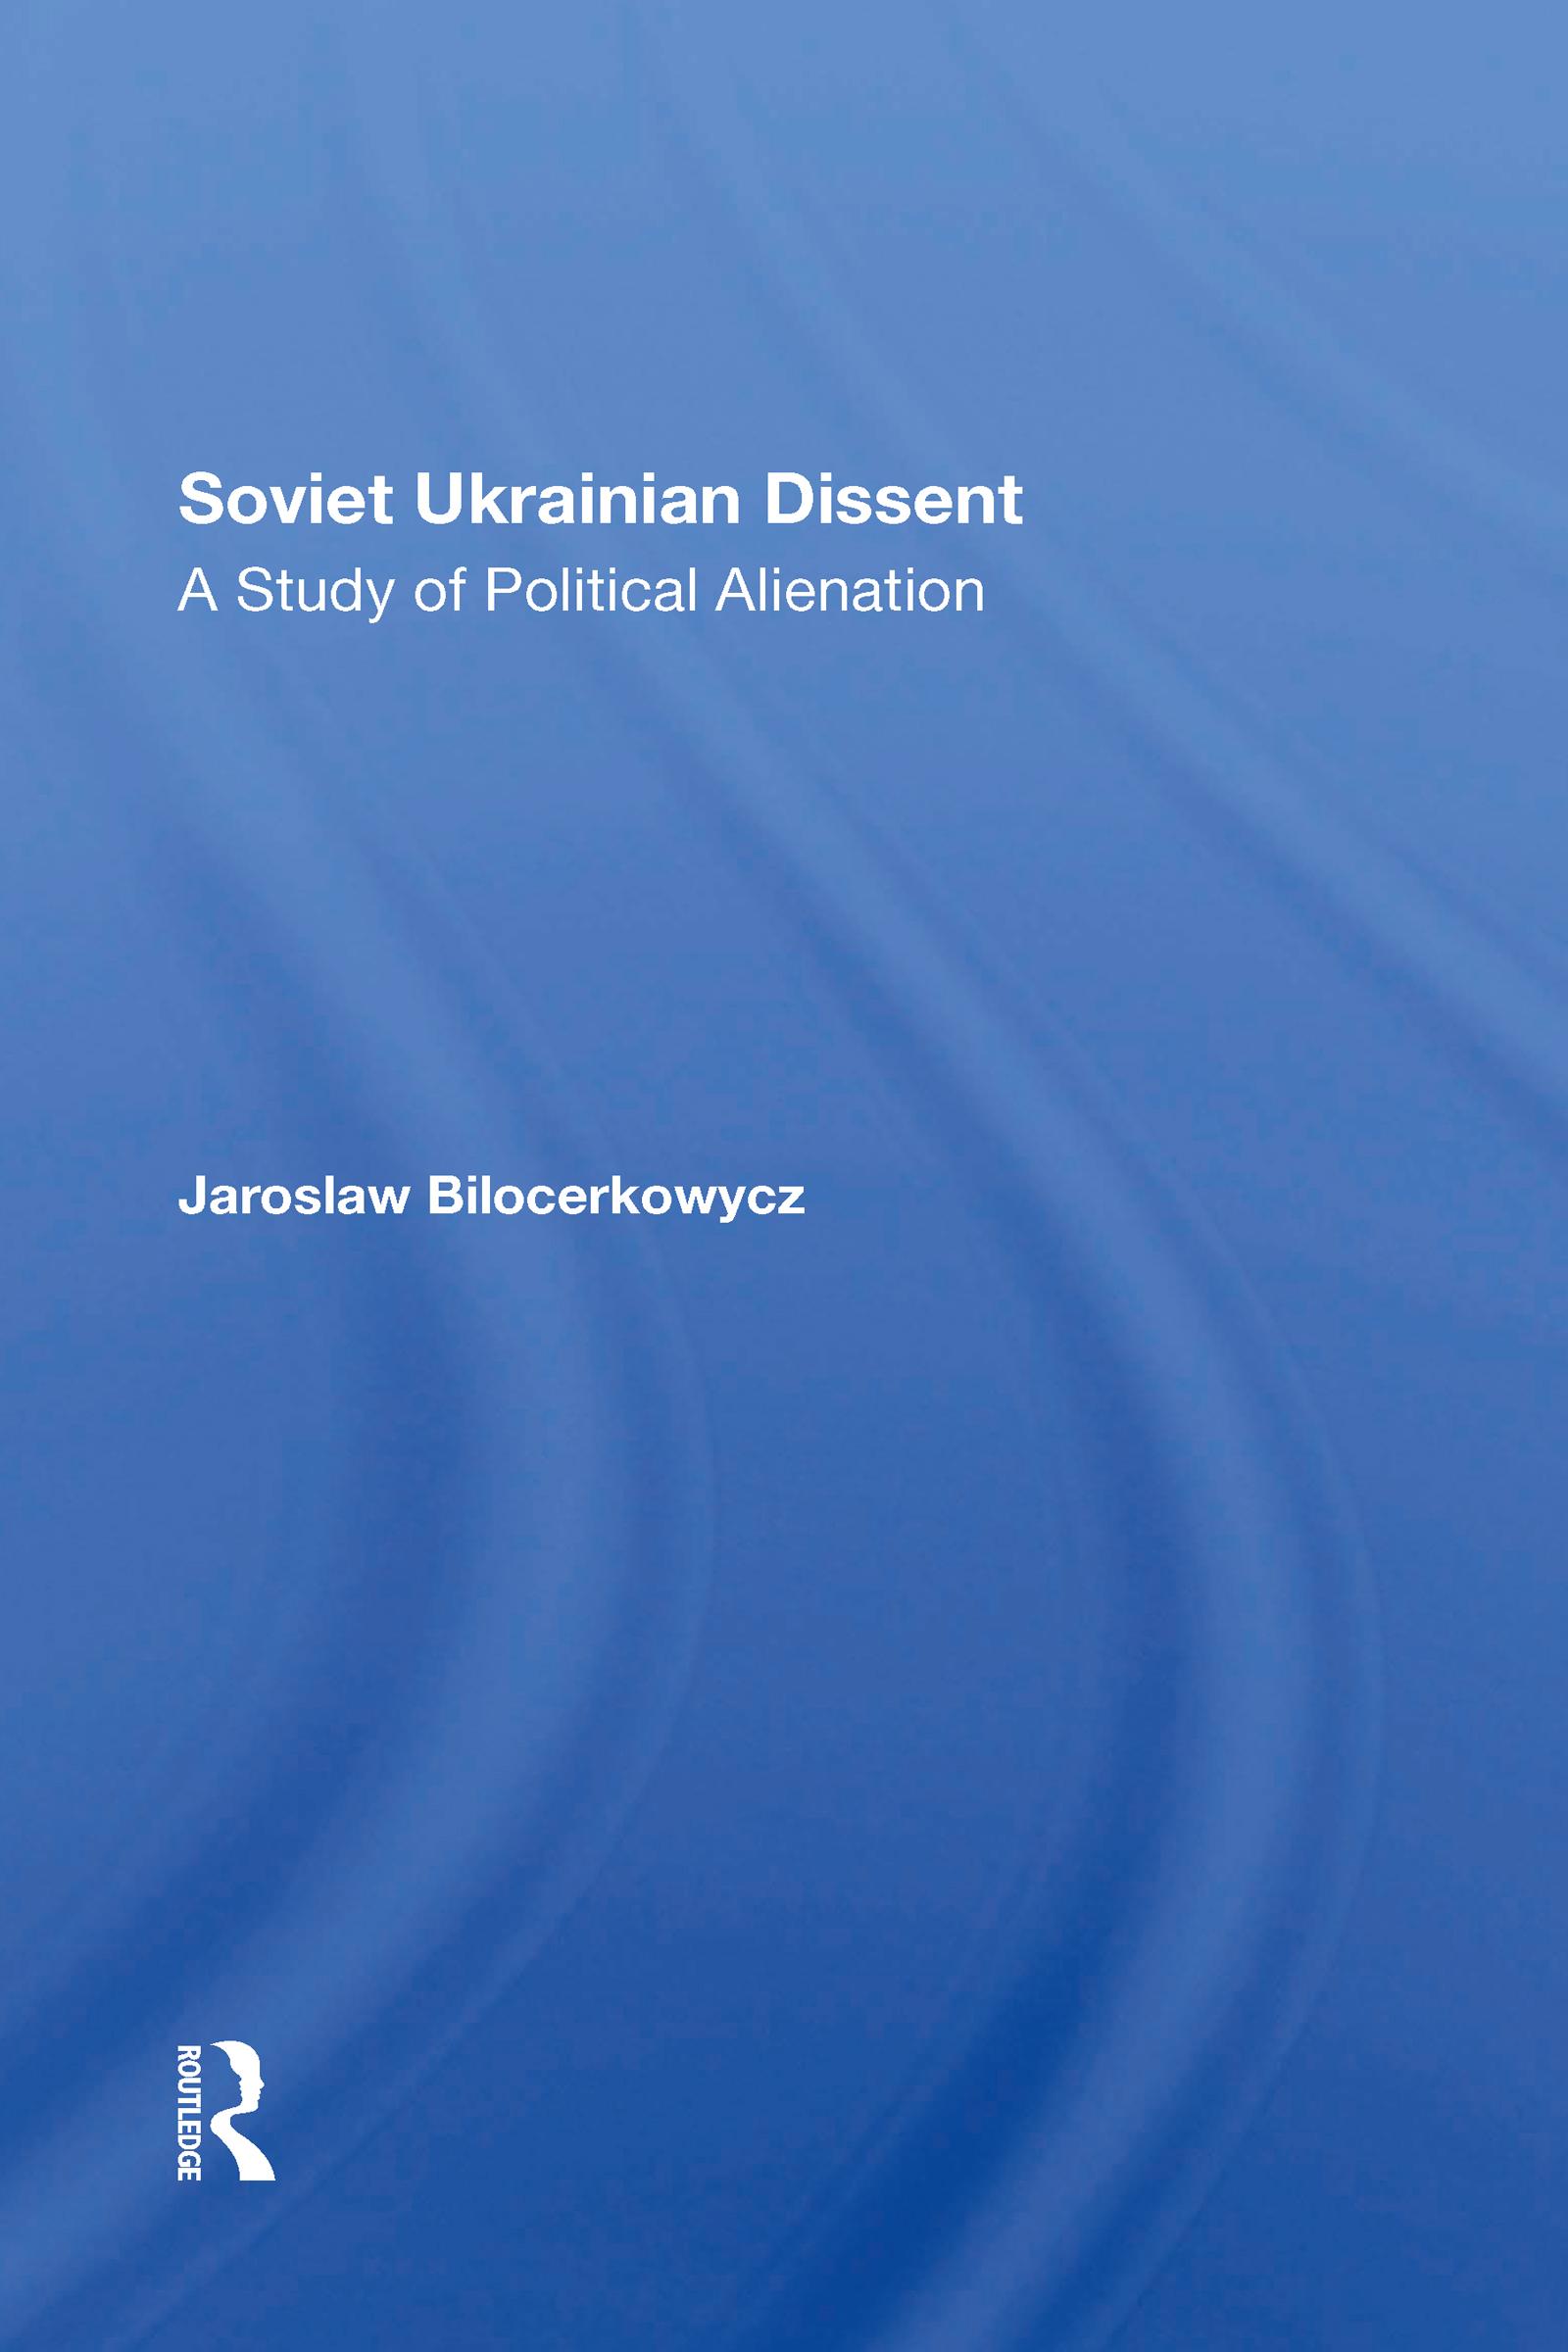 Soviet Ukrainian Dissent